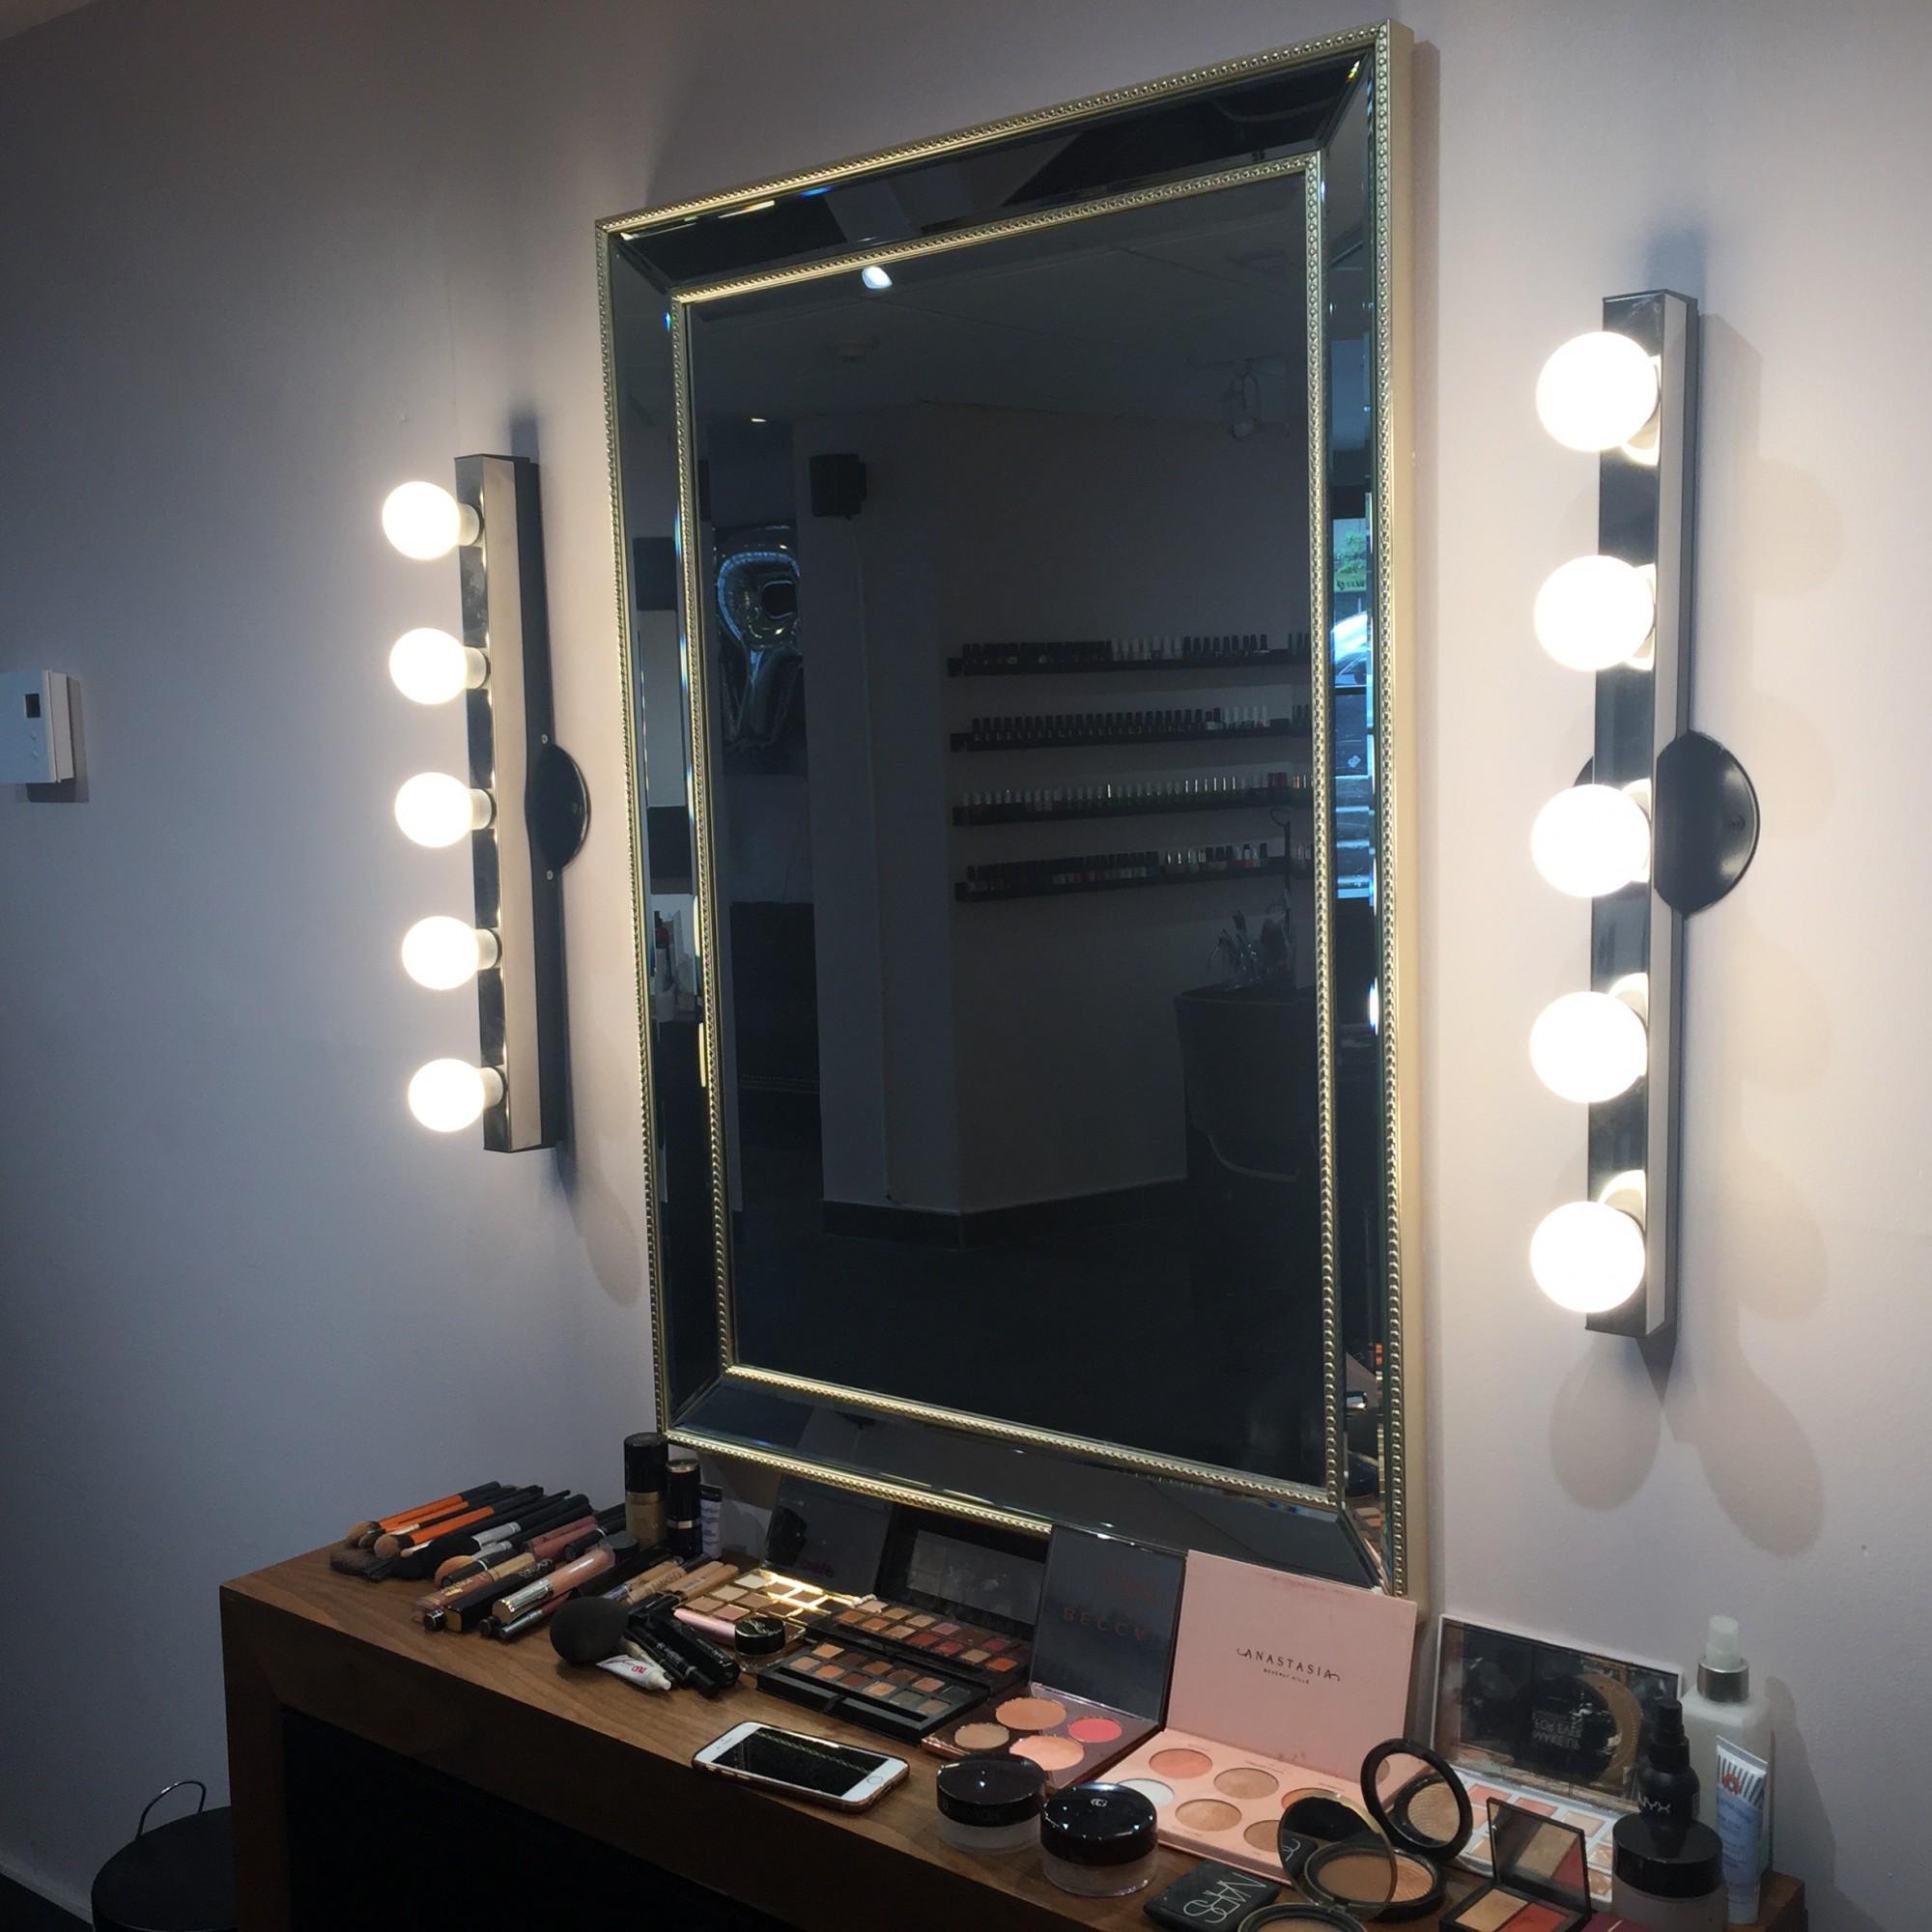 Barbs montreal queen mary hair salon makeup spray tan manicure pedicure blowout 3